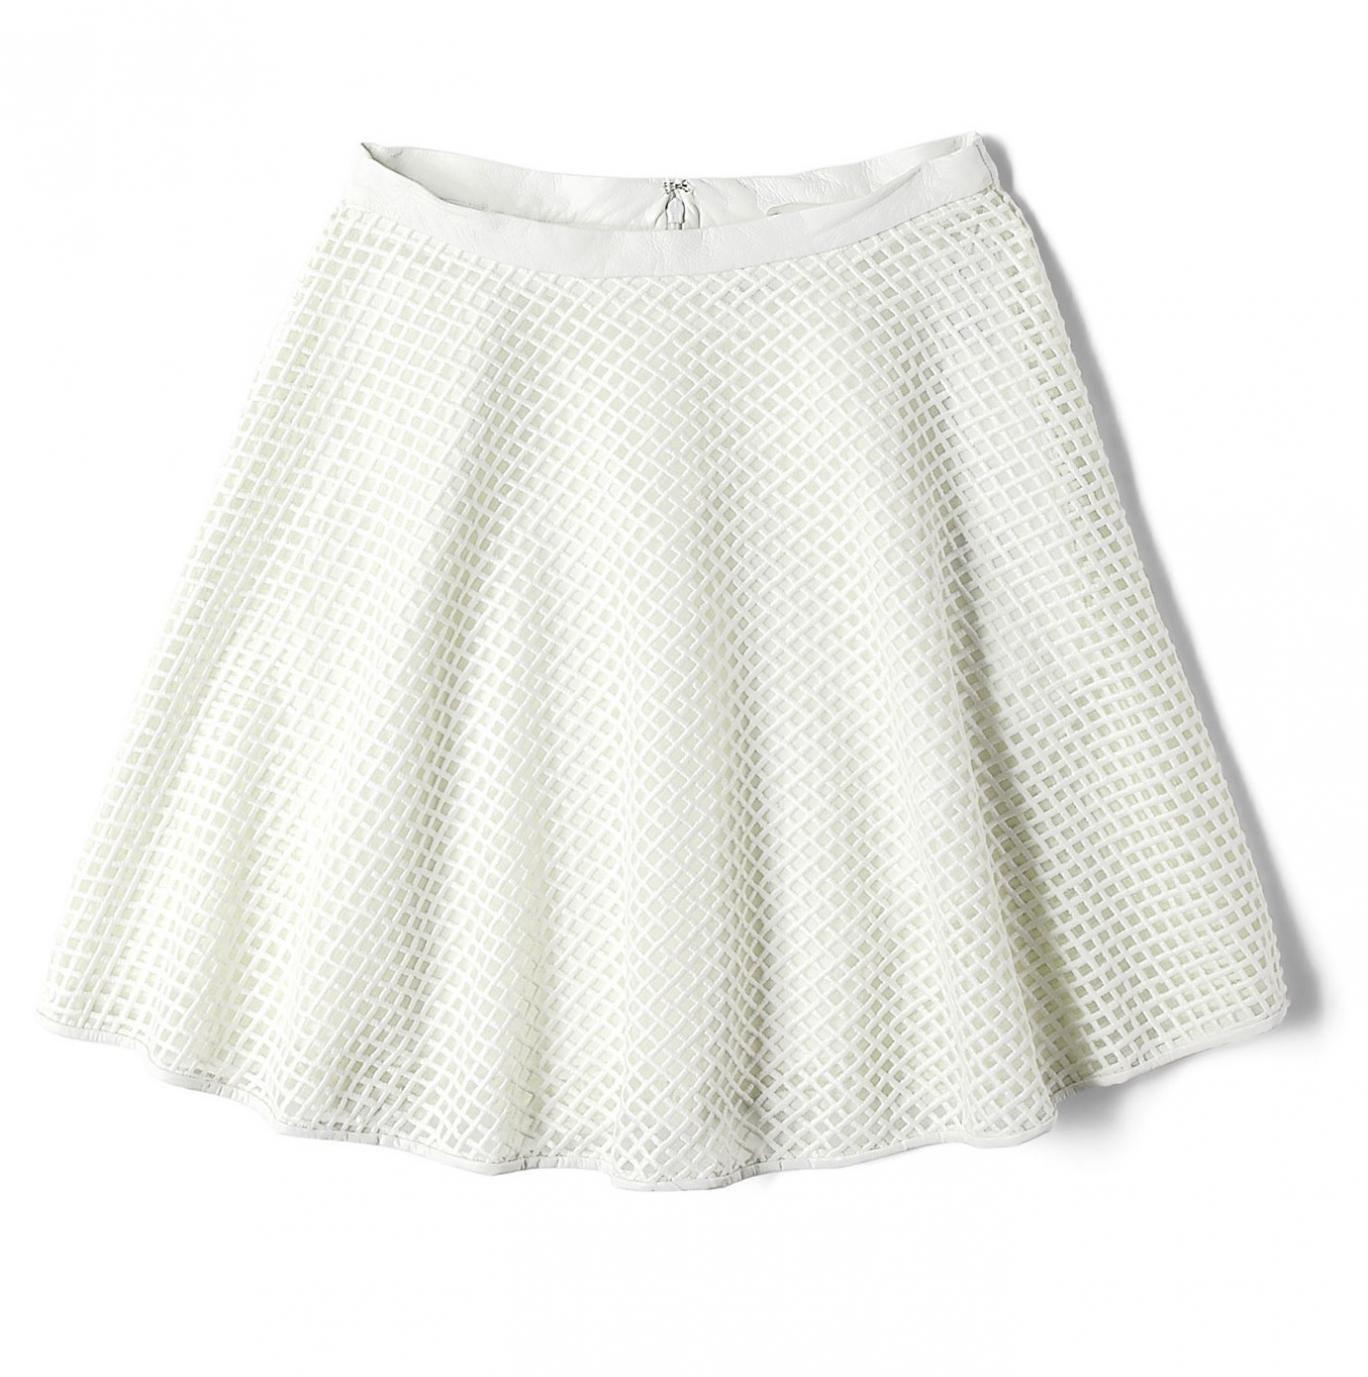 DKNY's lattice leather and tulle circle skirt, £265, my-wardrobe.com